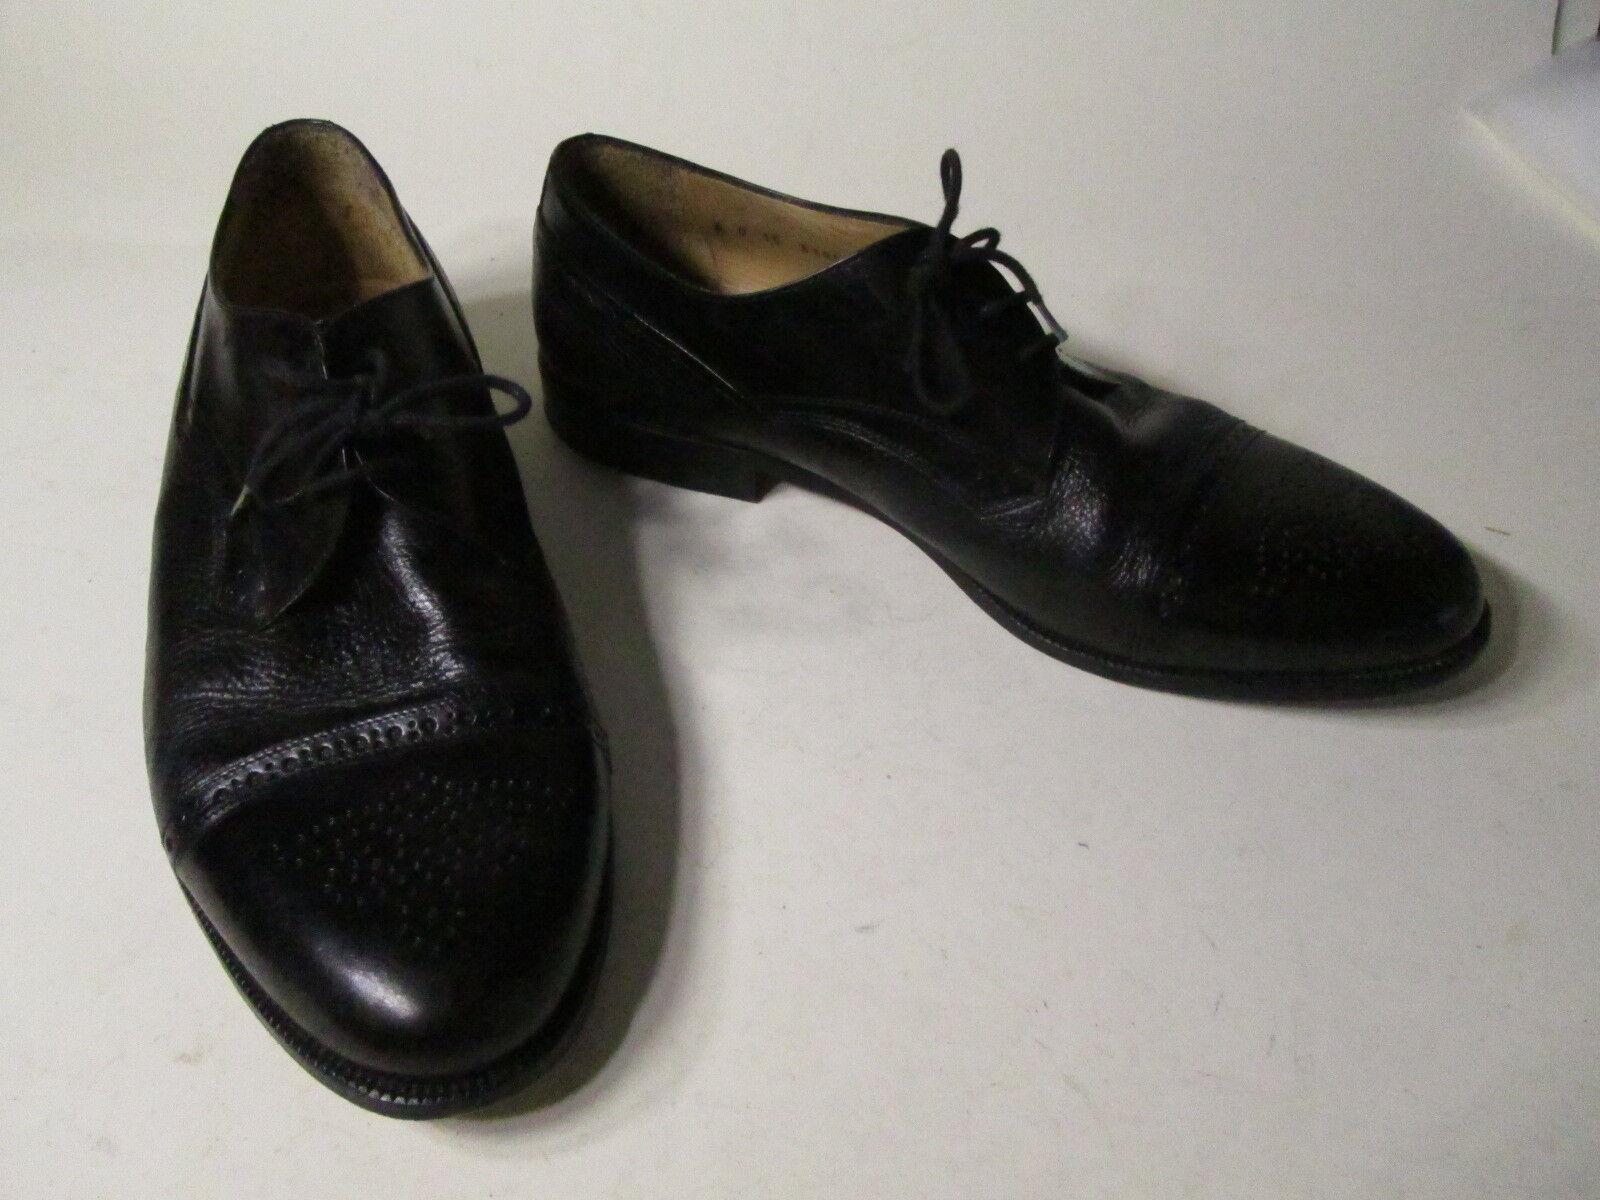 EUC  Men's Johnston & Murphy Cellini Black Leather Oxford Dress shoes sz 12 M